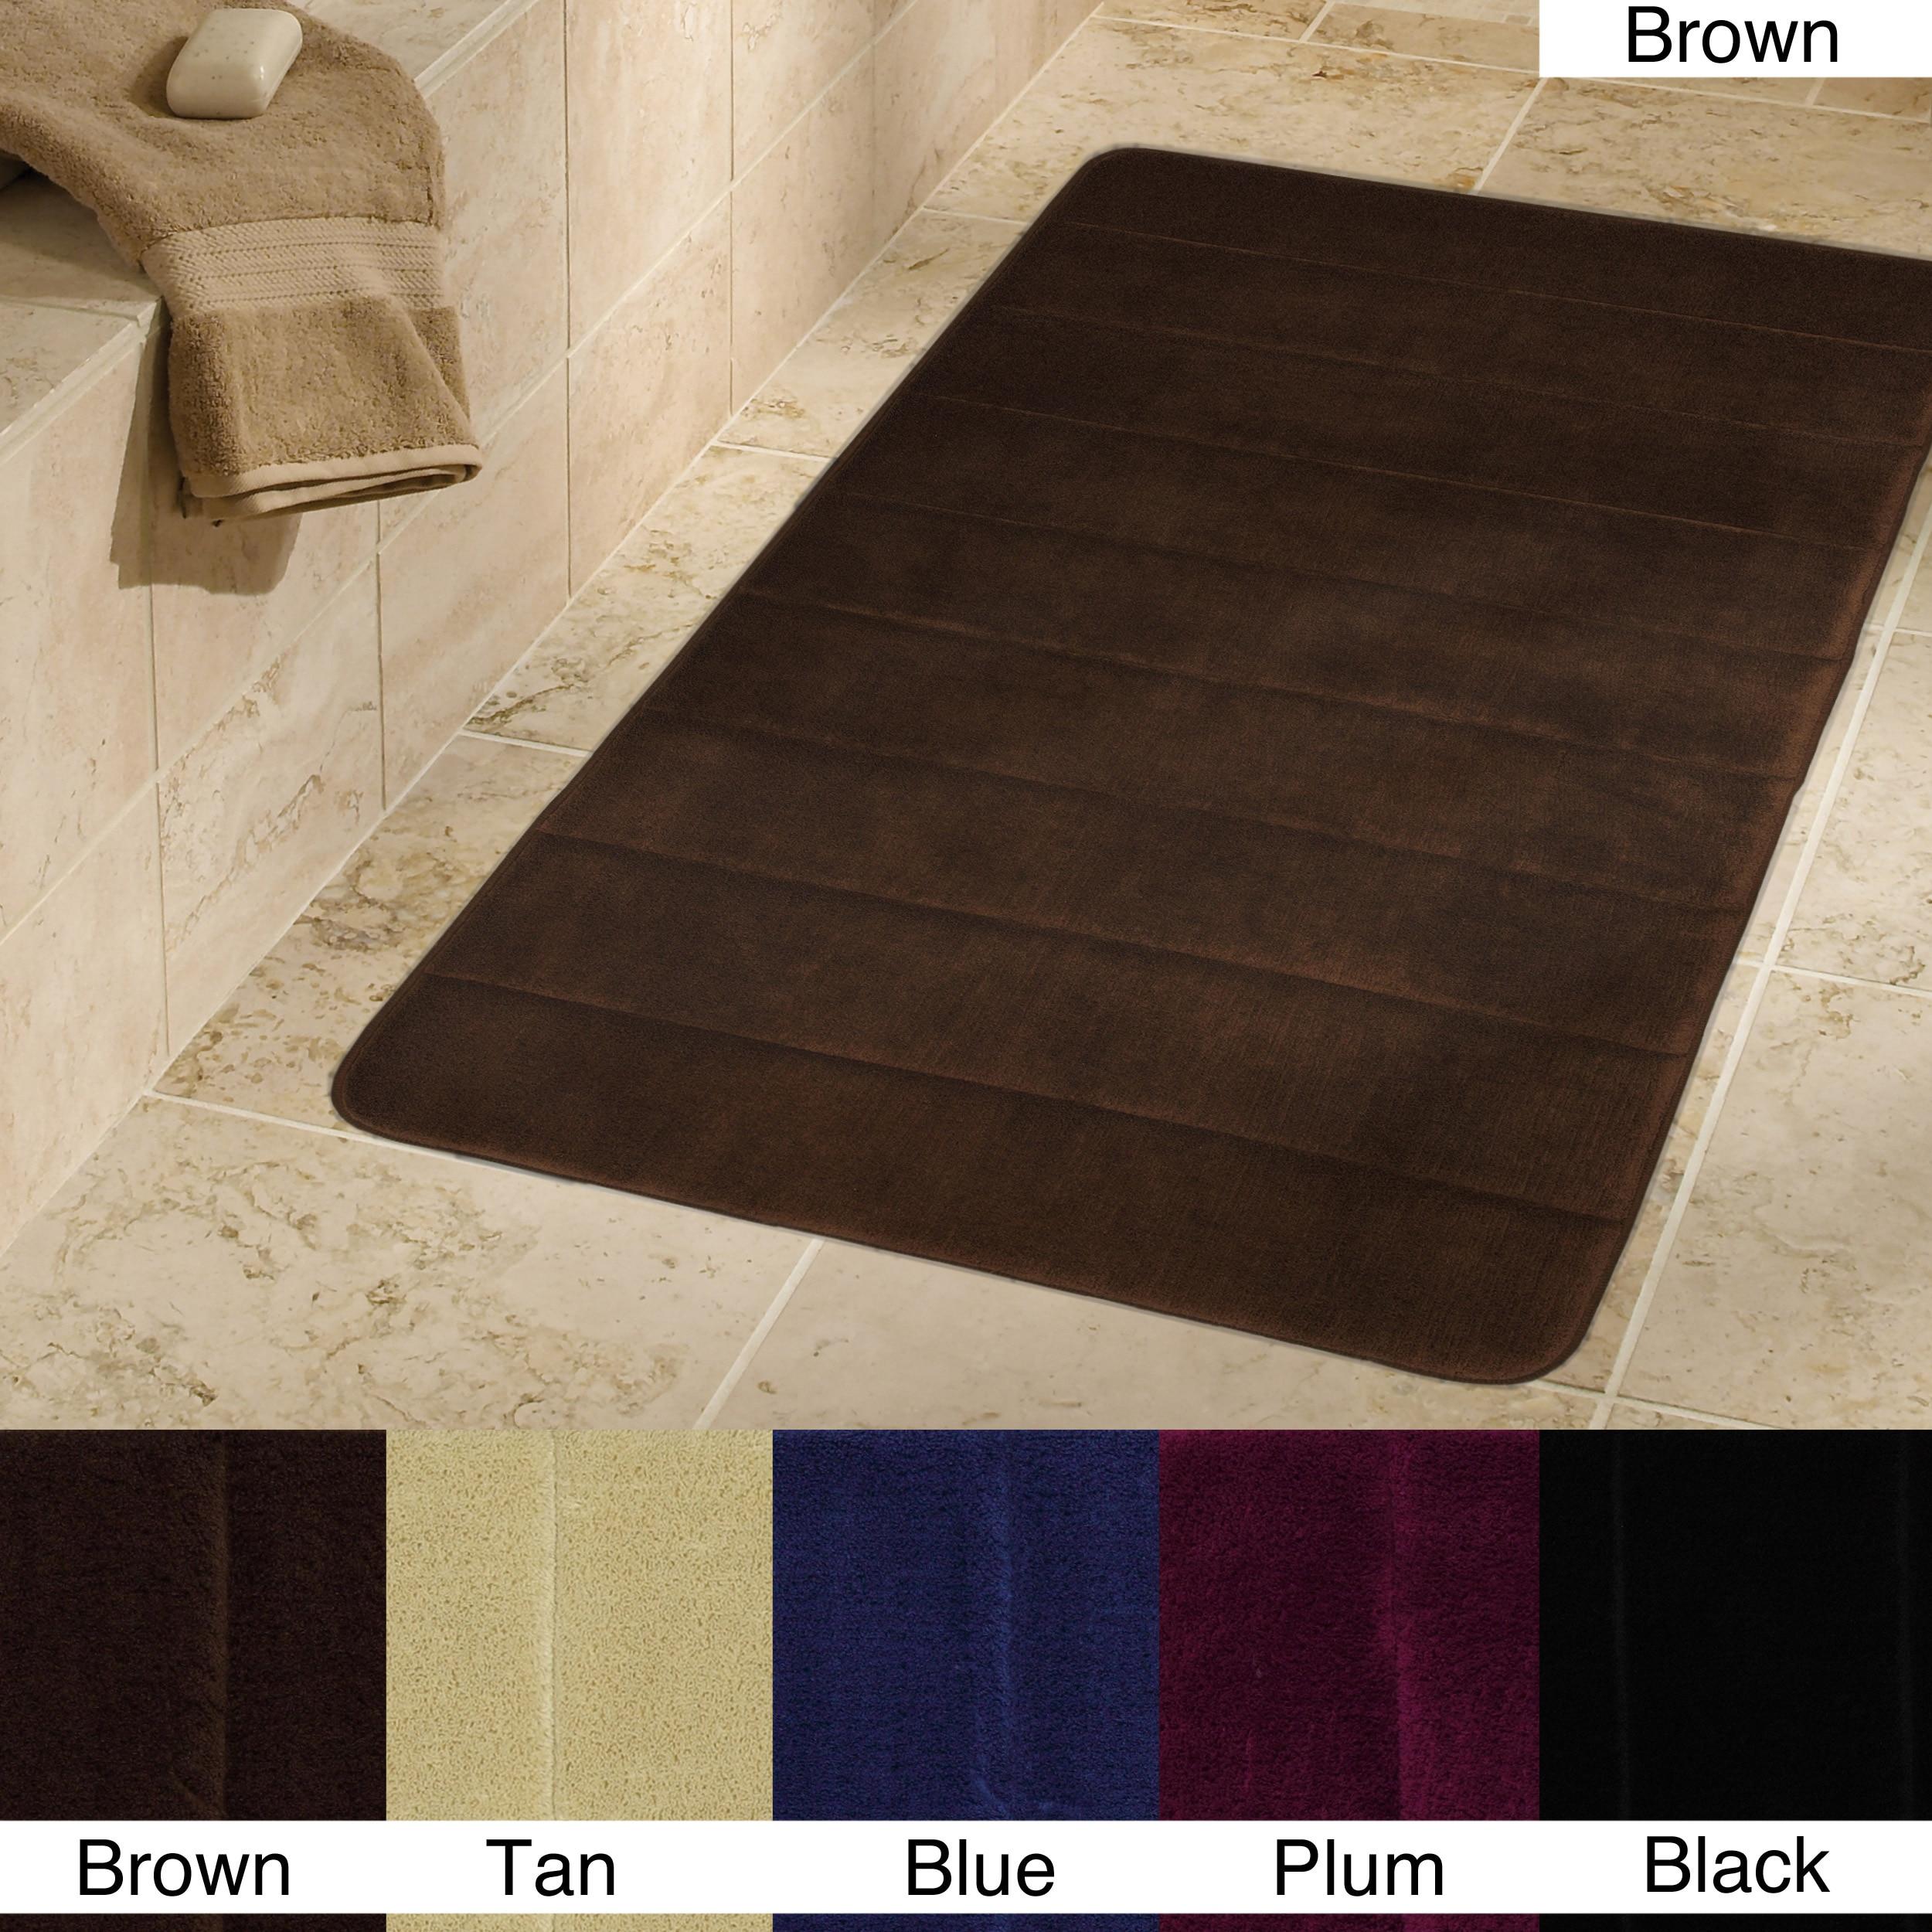 Cushion Foam 19.5 x 36 Bath Mat (Set of 2)